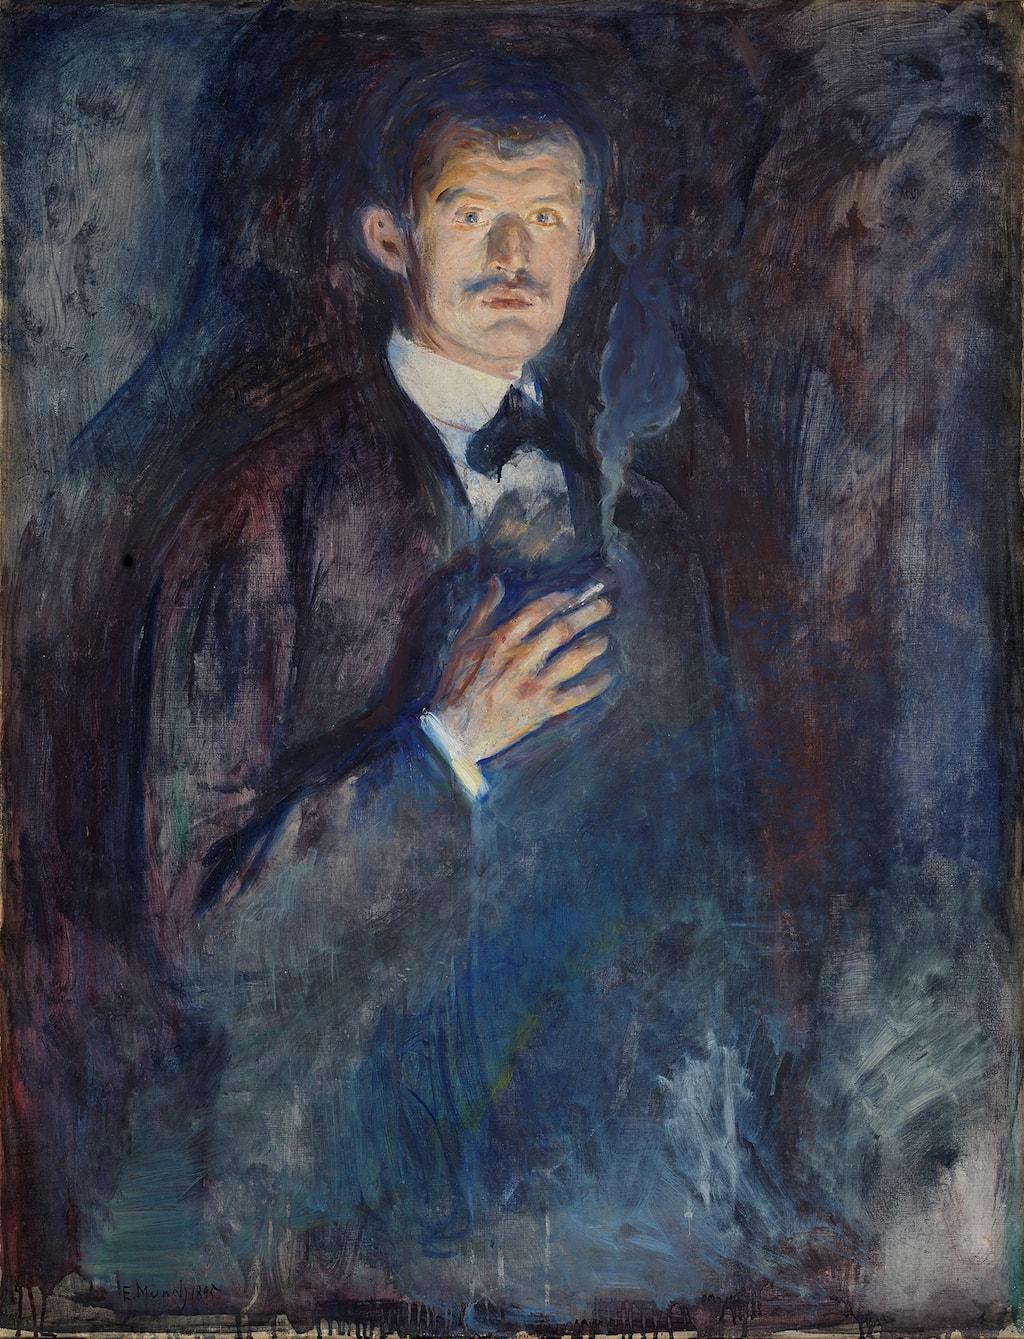 Edvard Munch's 'Self-Portrait with Cigarette', 1895 | © 2017 Artists Rights society (ARS), New York / Nasjonalmuseet, Oslo / Børre Høstland